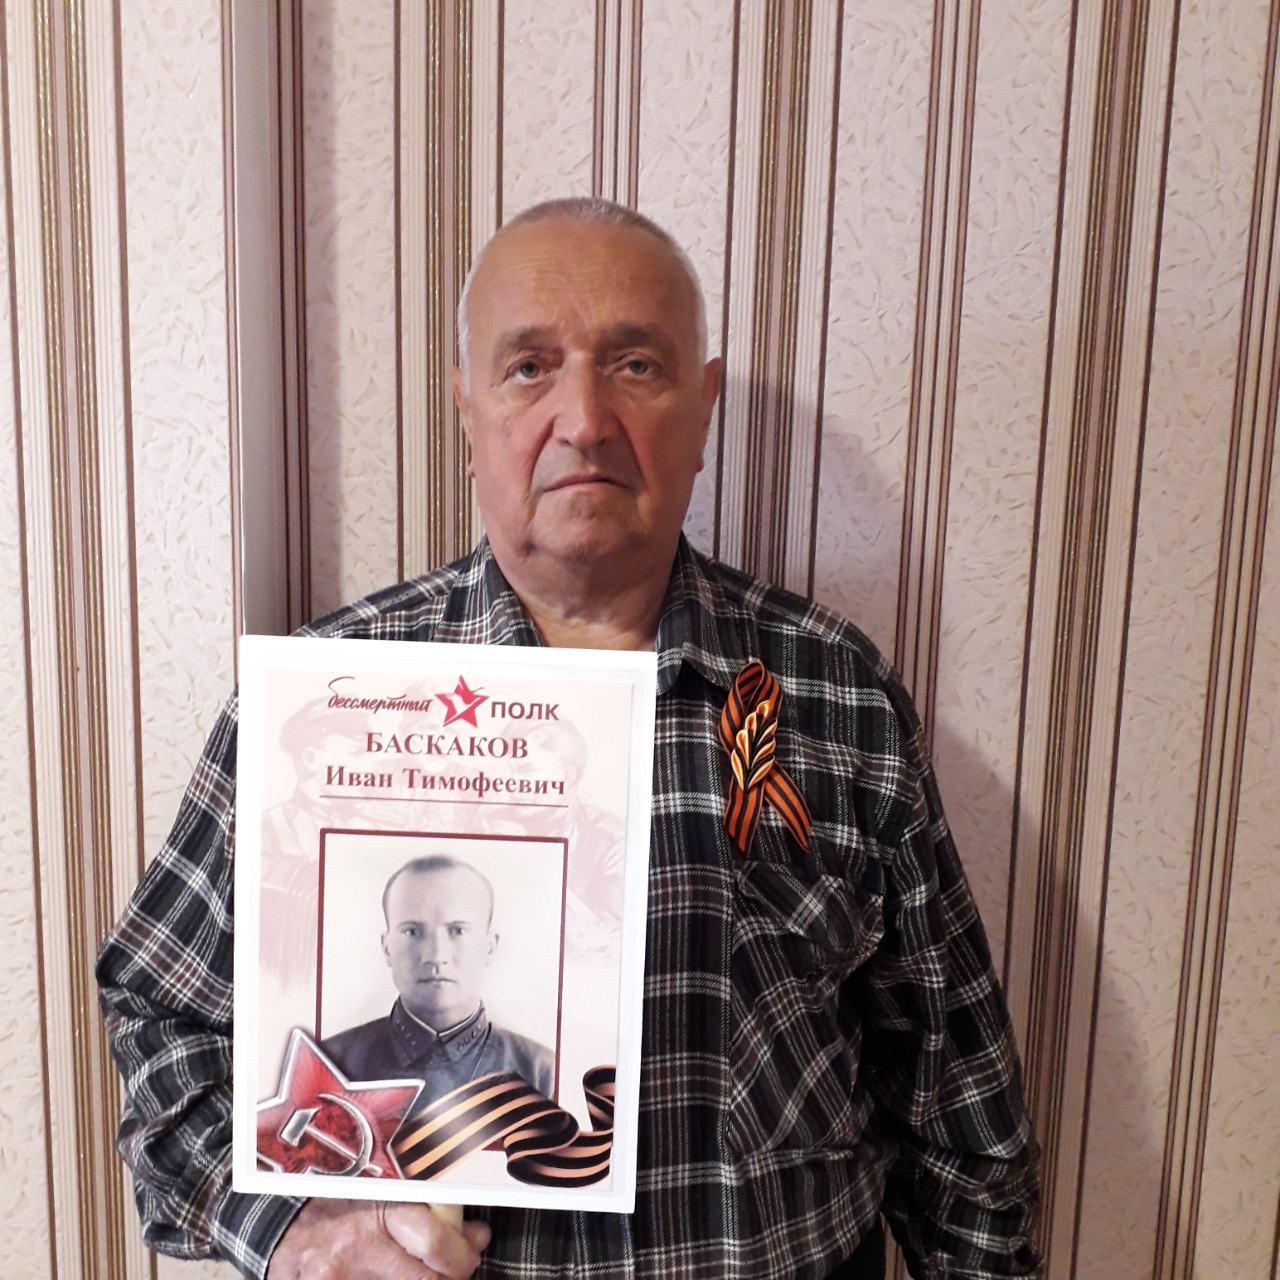 Виноградов-Иван-Владимирович